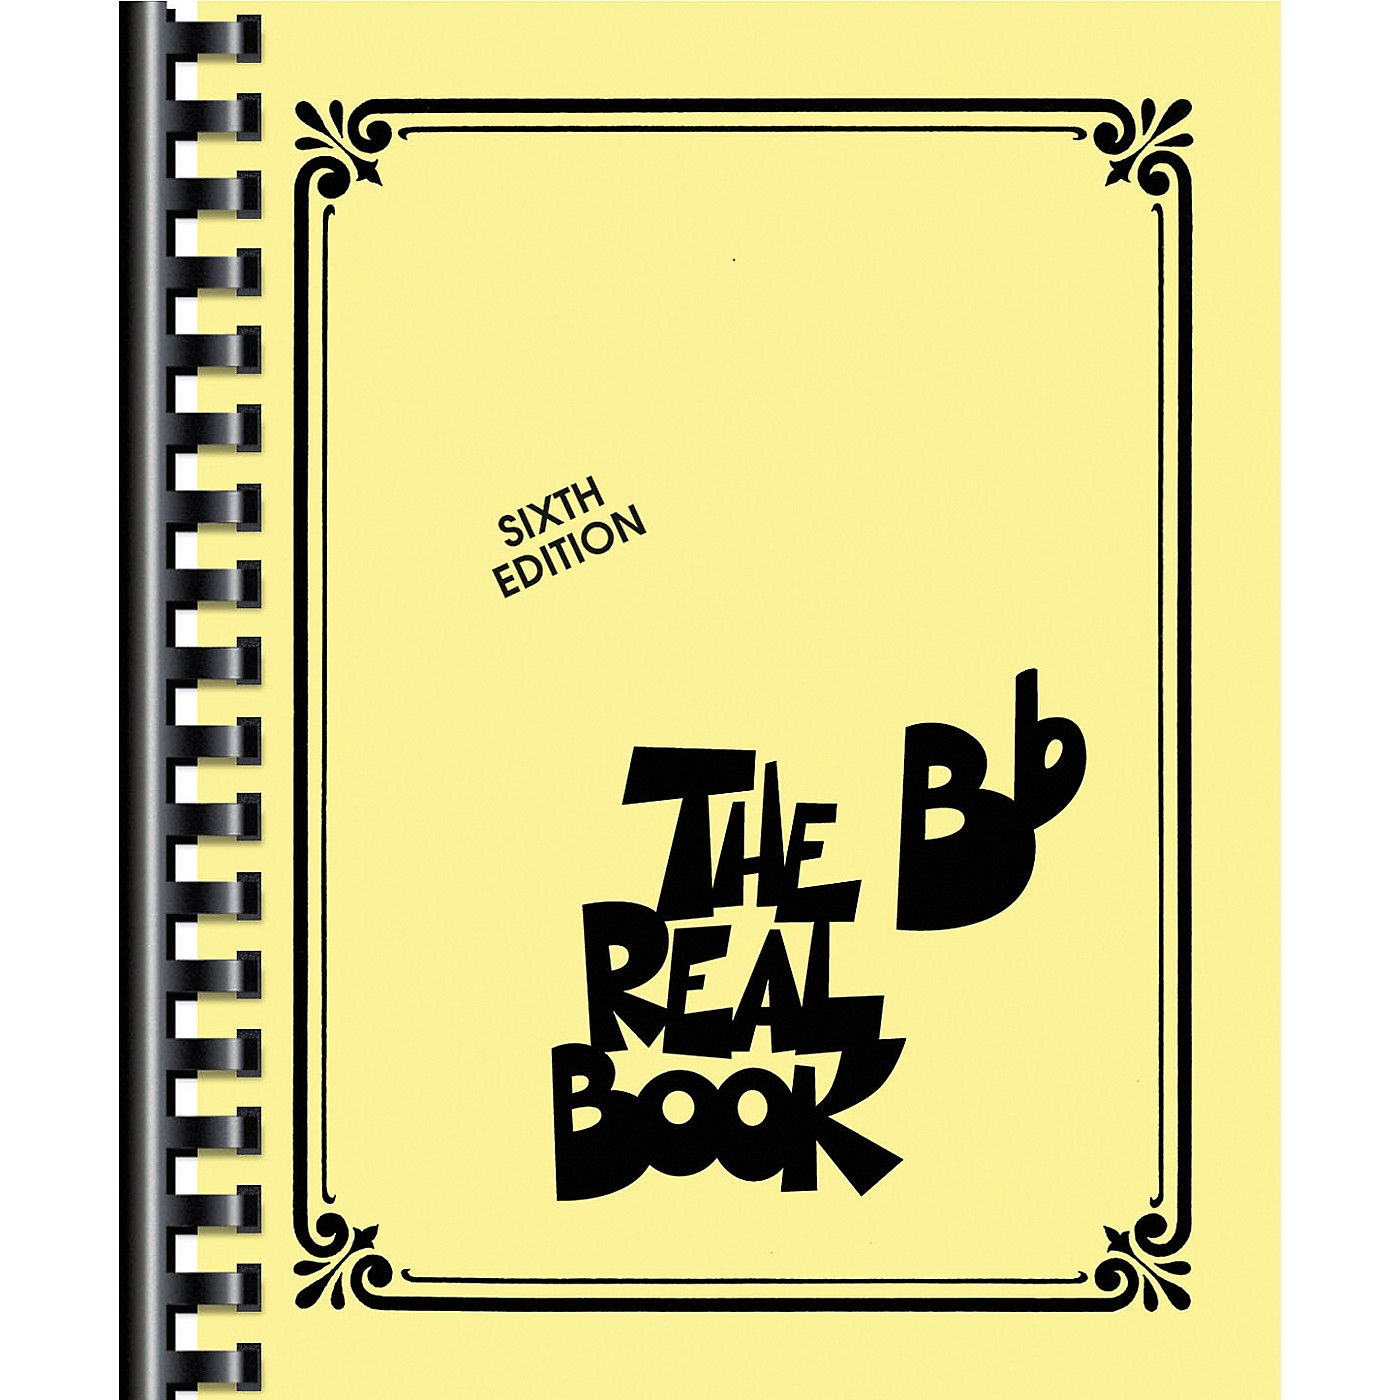 Hal Leonard The Real Book, Volume I Sixth Edition (Bb Instruments) thumbnail